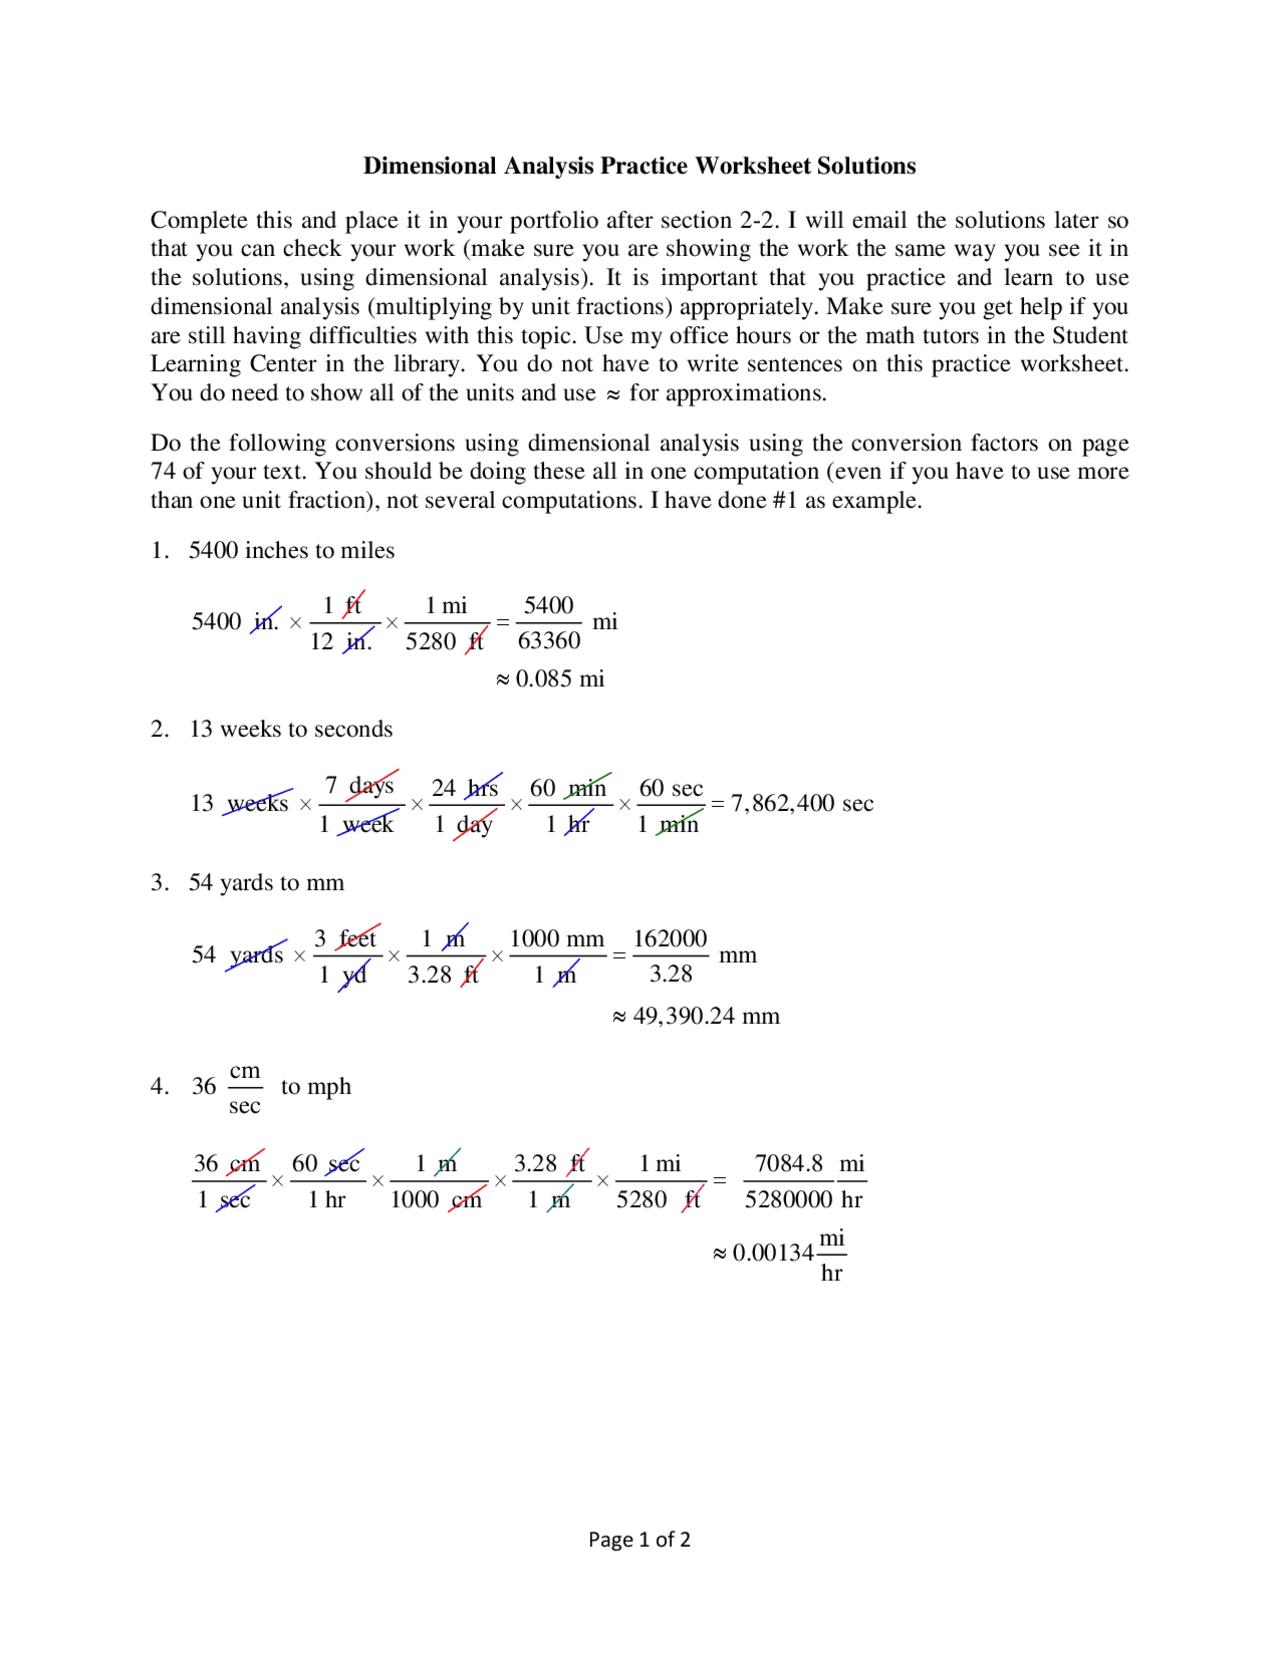 Dimensional Analysis Practice Worksheet Answers - Docsity In Dimensional Analysis Practice Worksheet